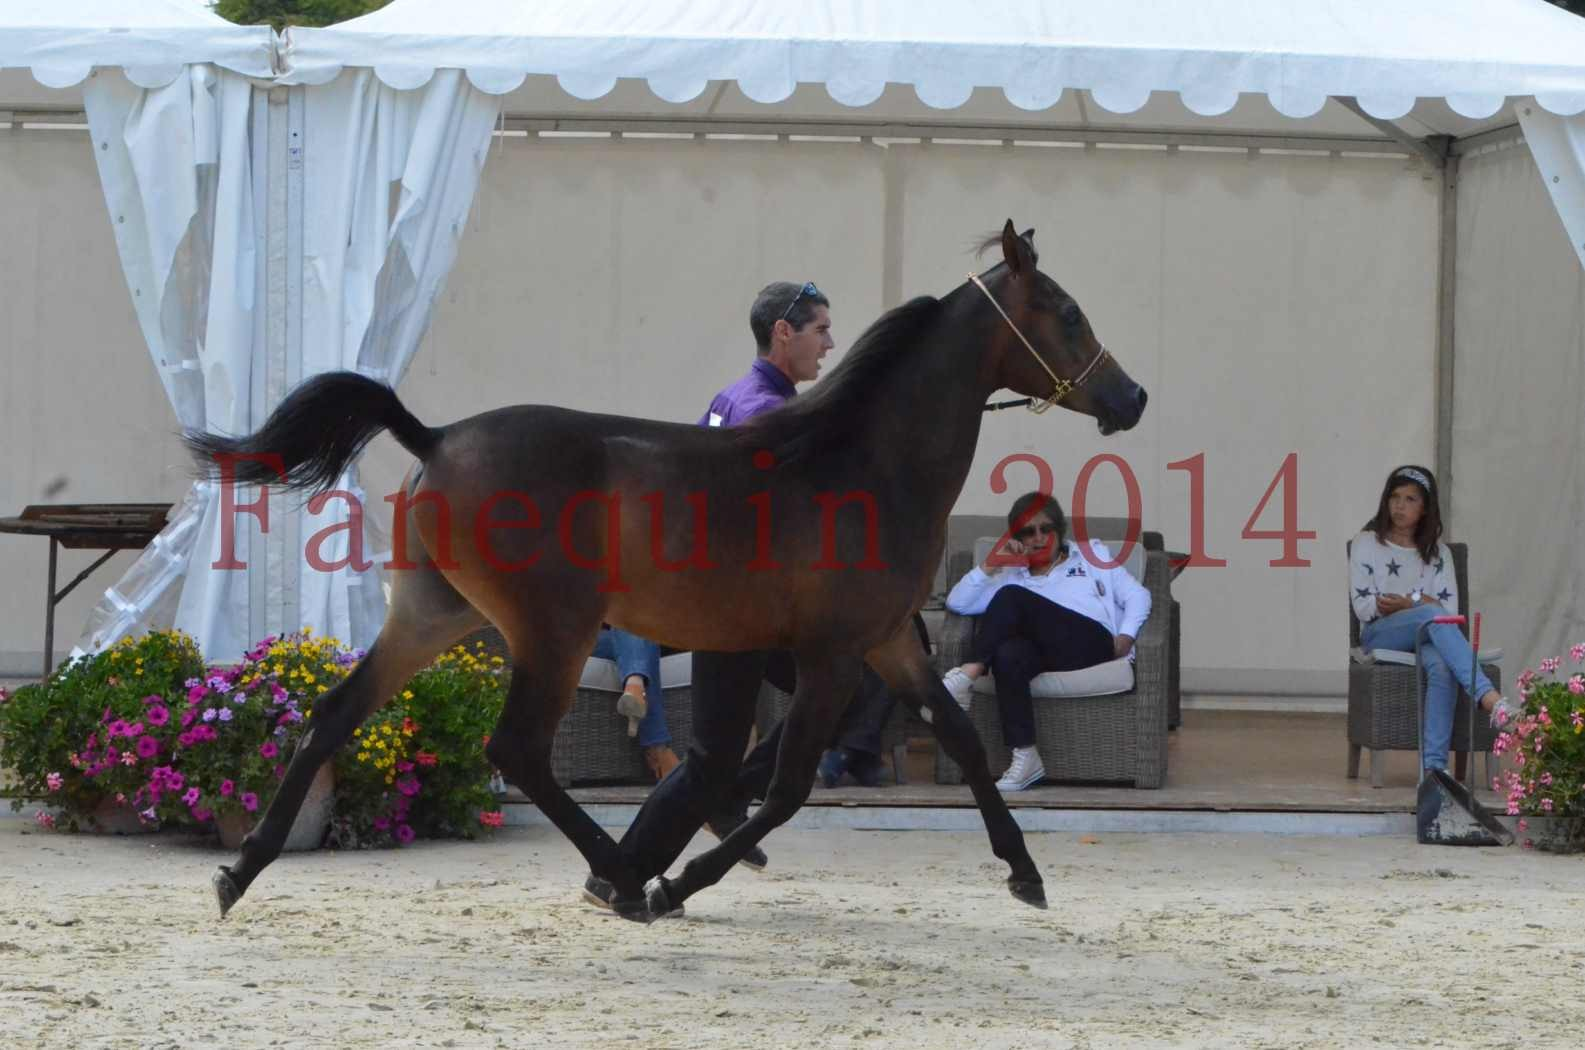 Championnat de FRANCE 2014 - Amateurs - SH FARAJAA - 16